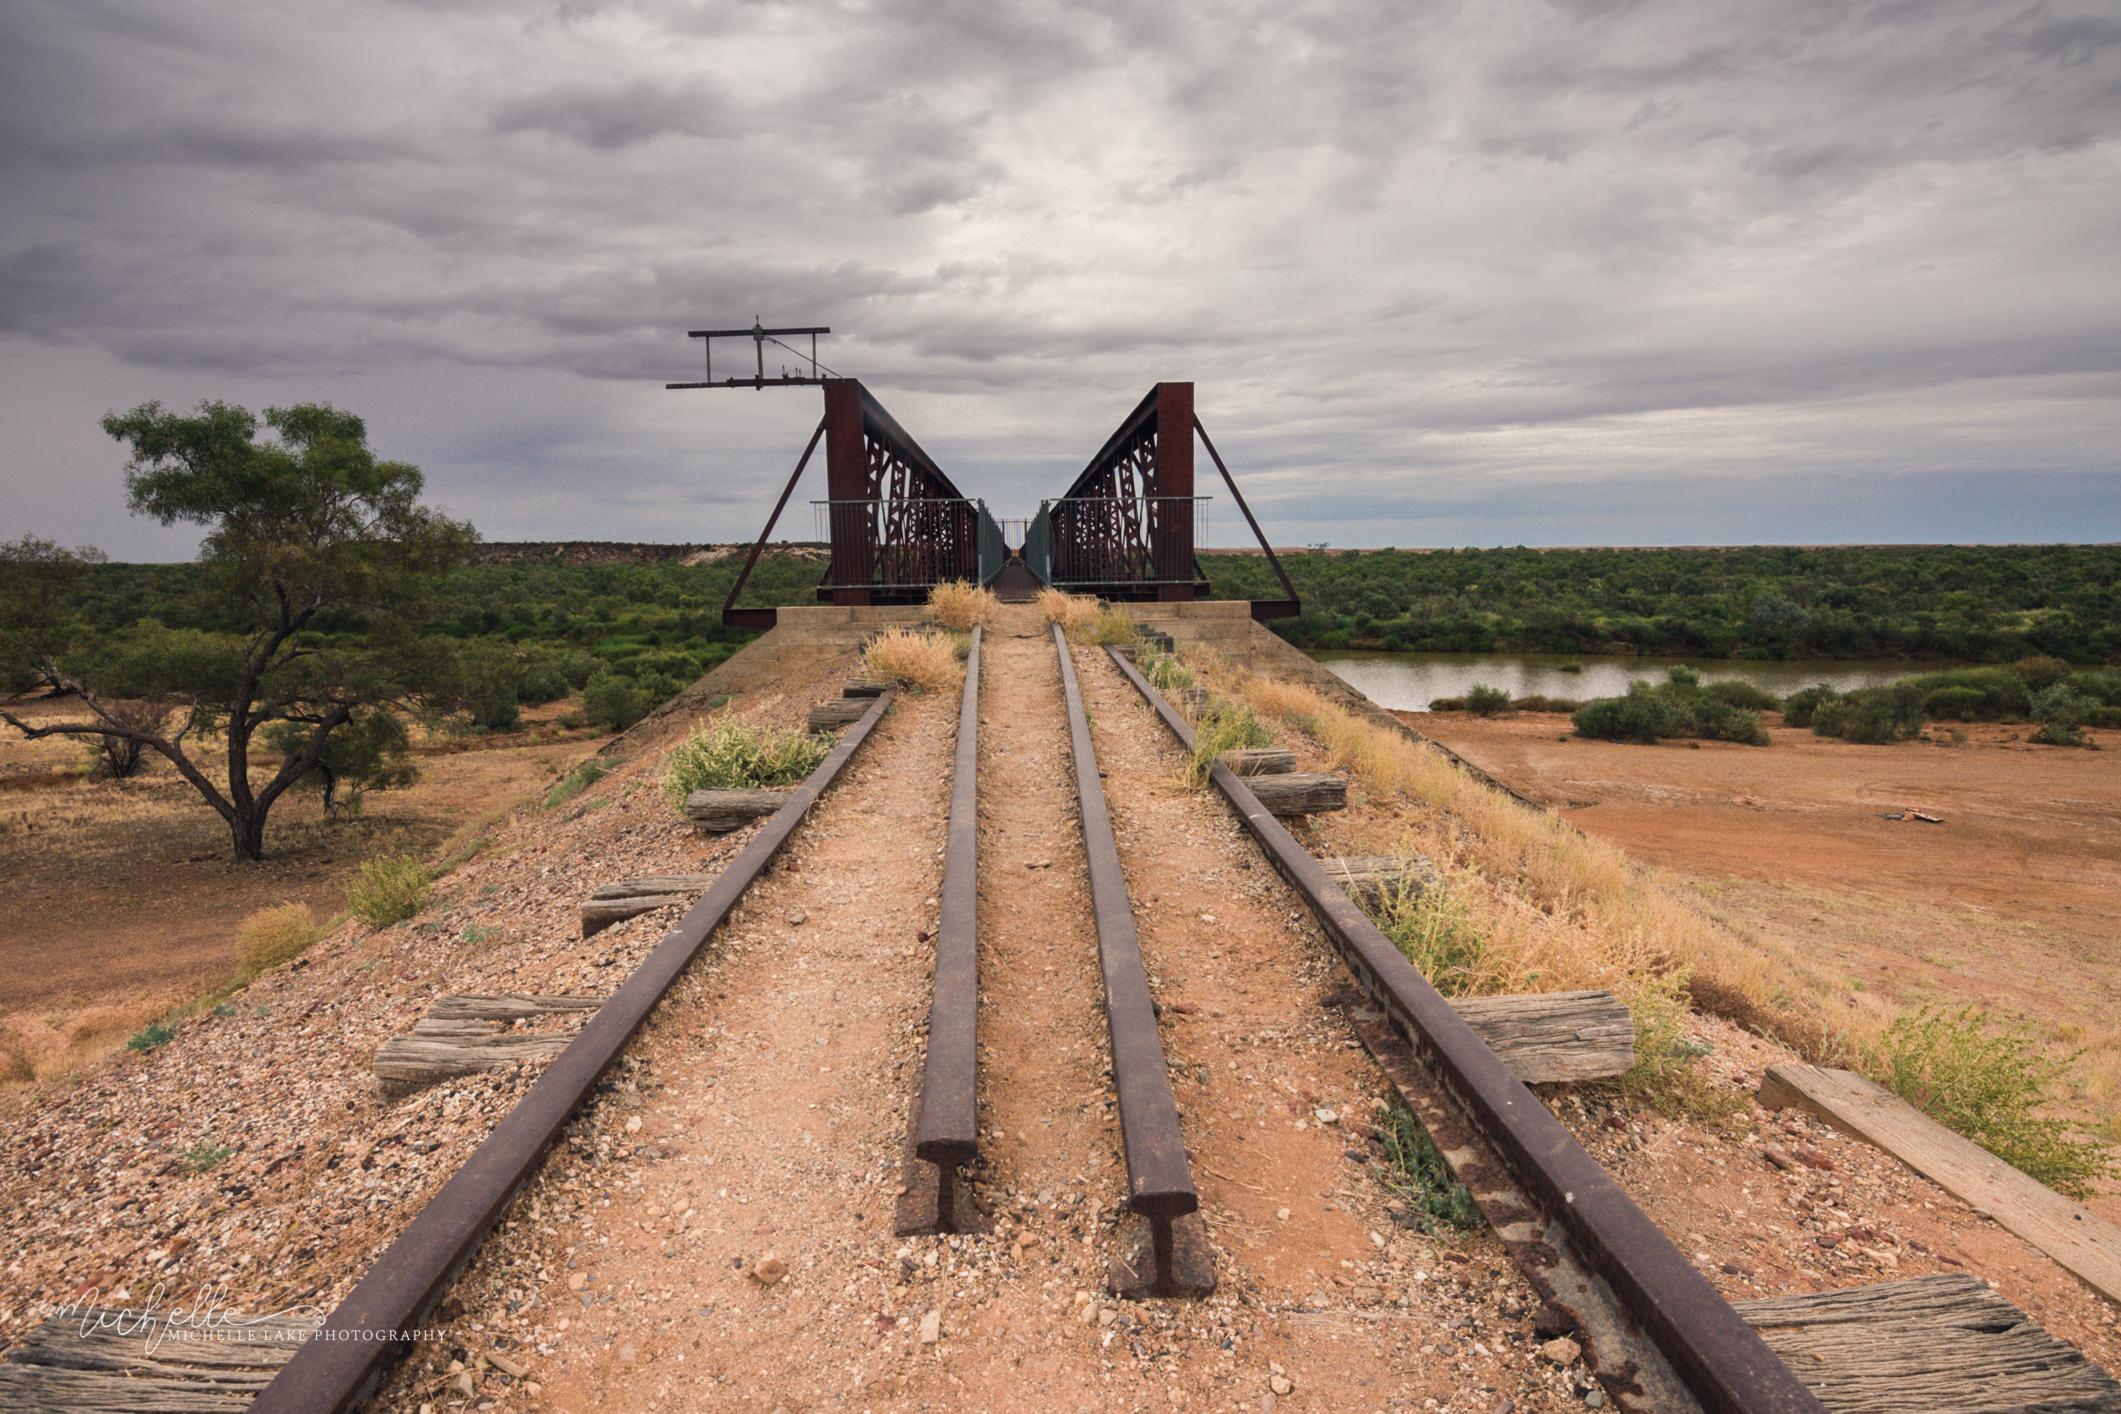 The Algebuckina Bridge, near the Oodnadatta Track, Outback South Australia